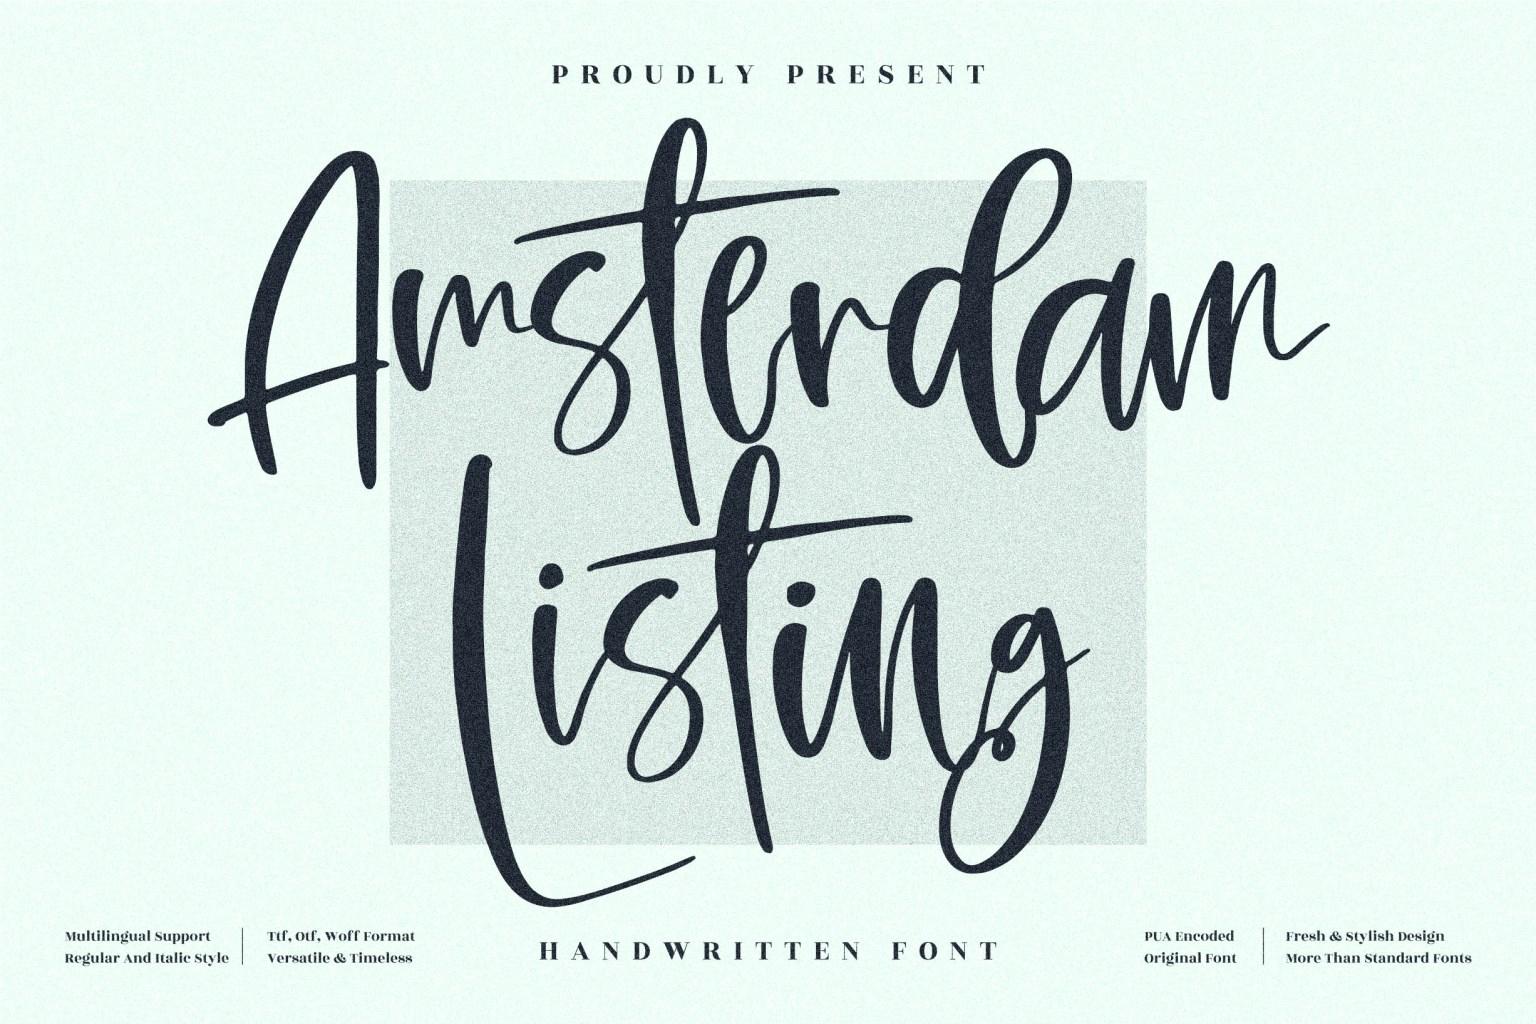 Amsterdam Listing Script Font